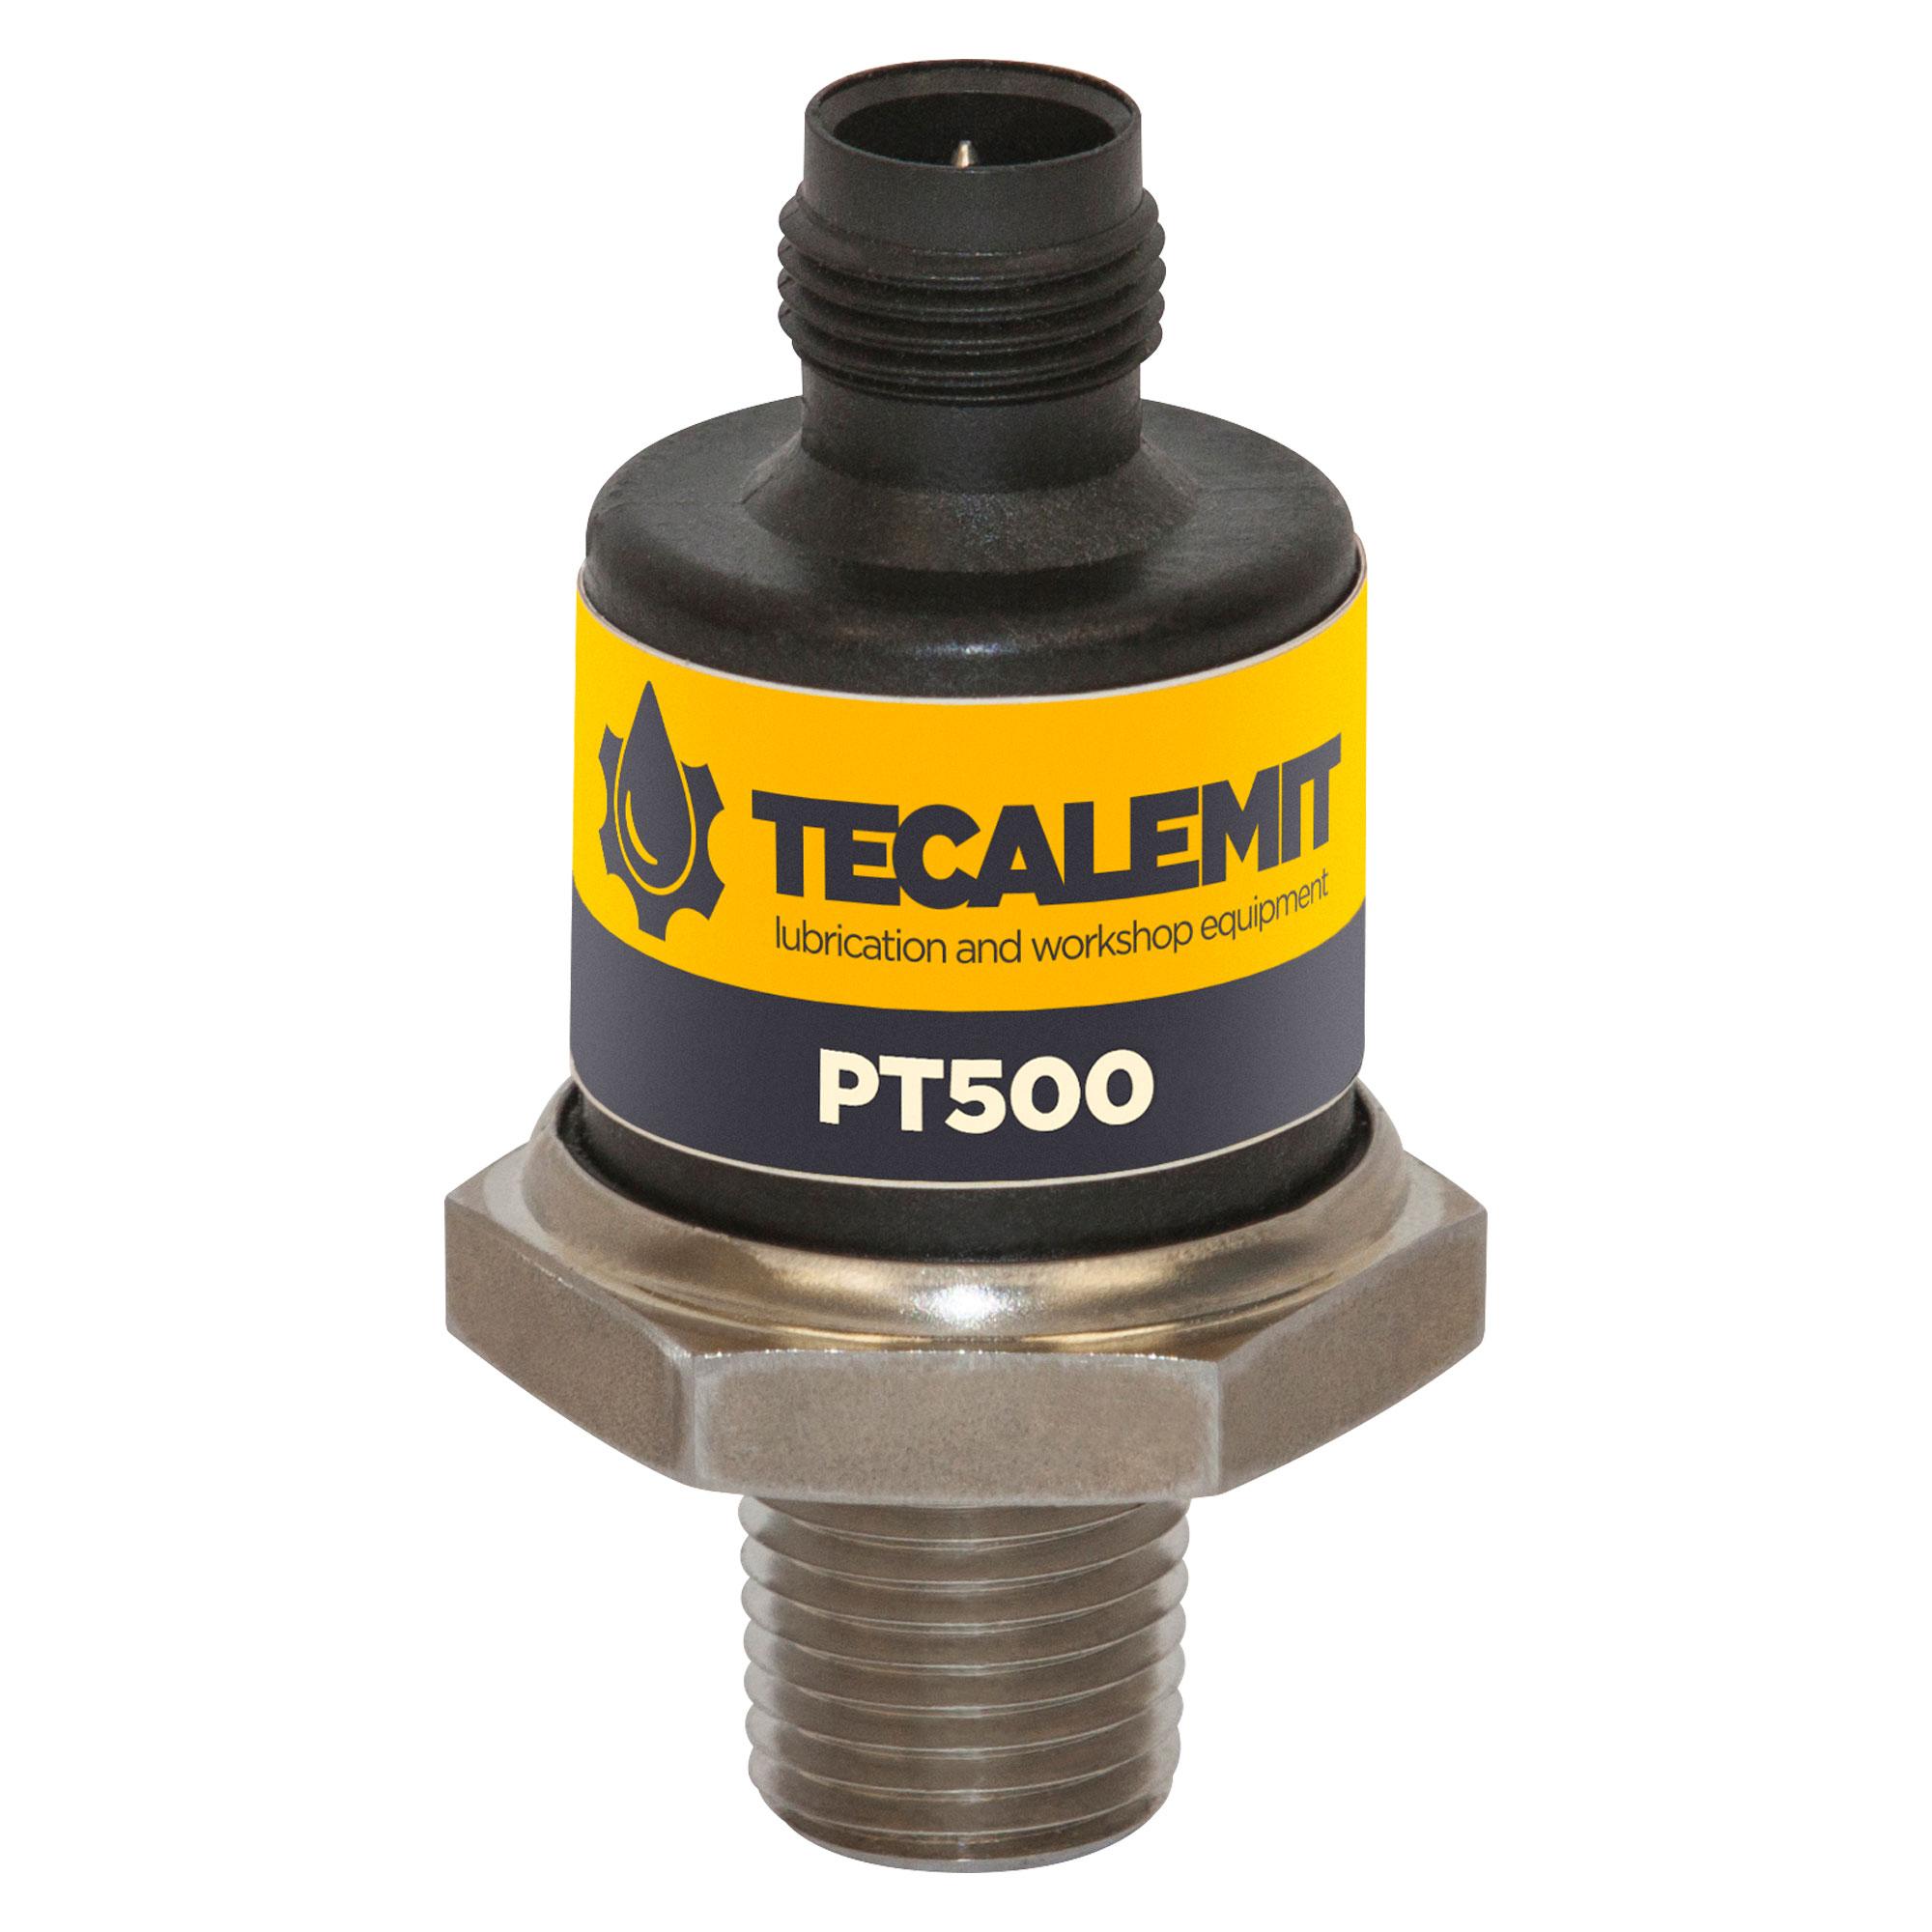 PT500 - Pressure Transducer